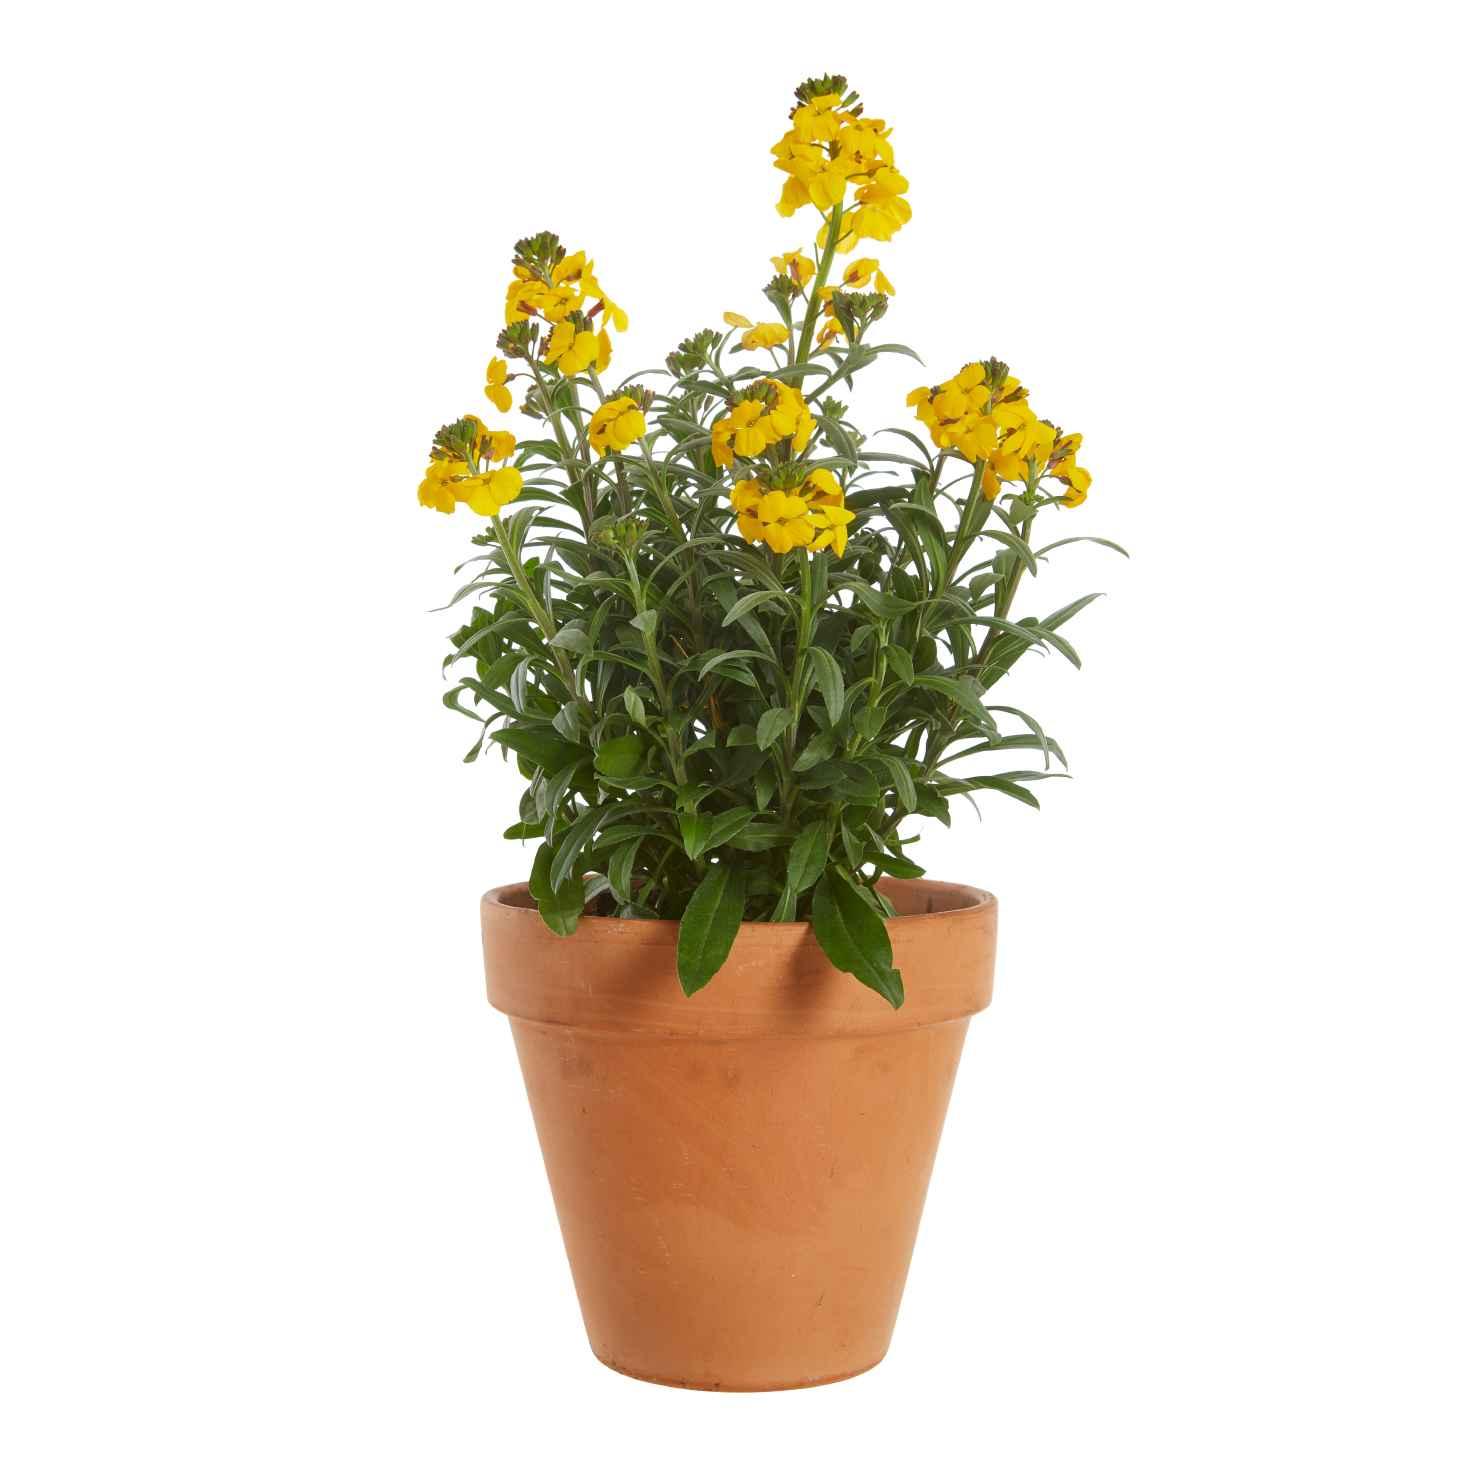 Produktbild på Gyllenlack, gul